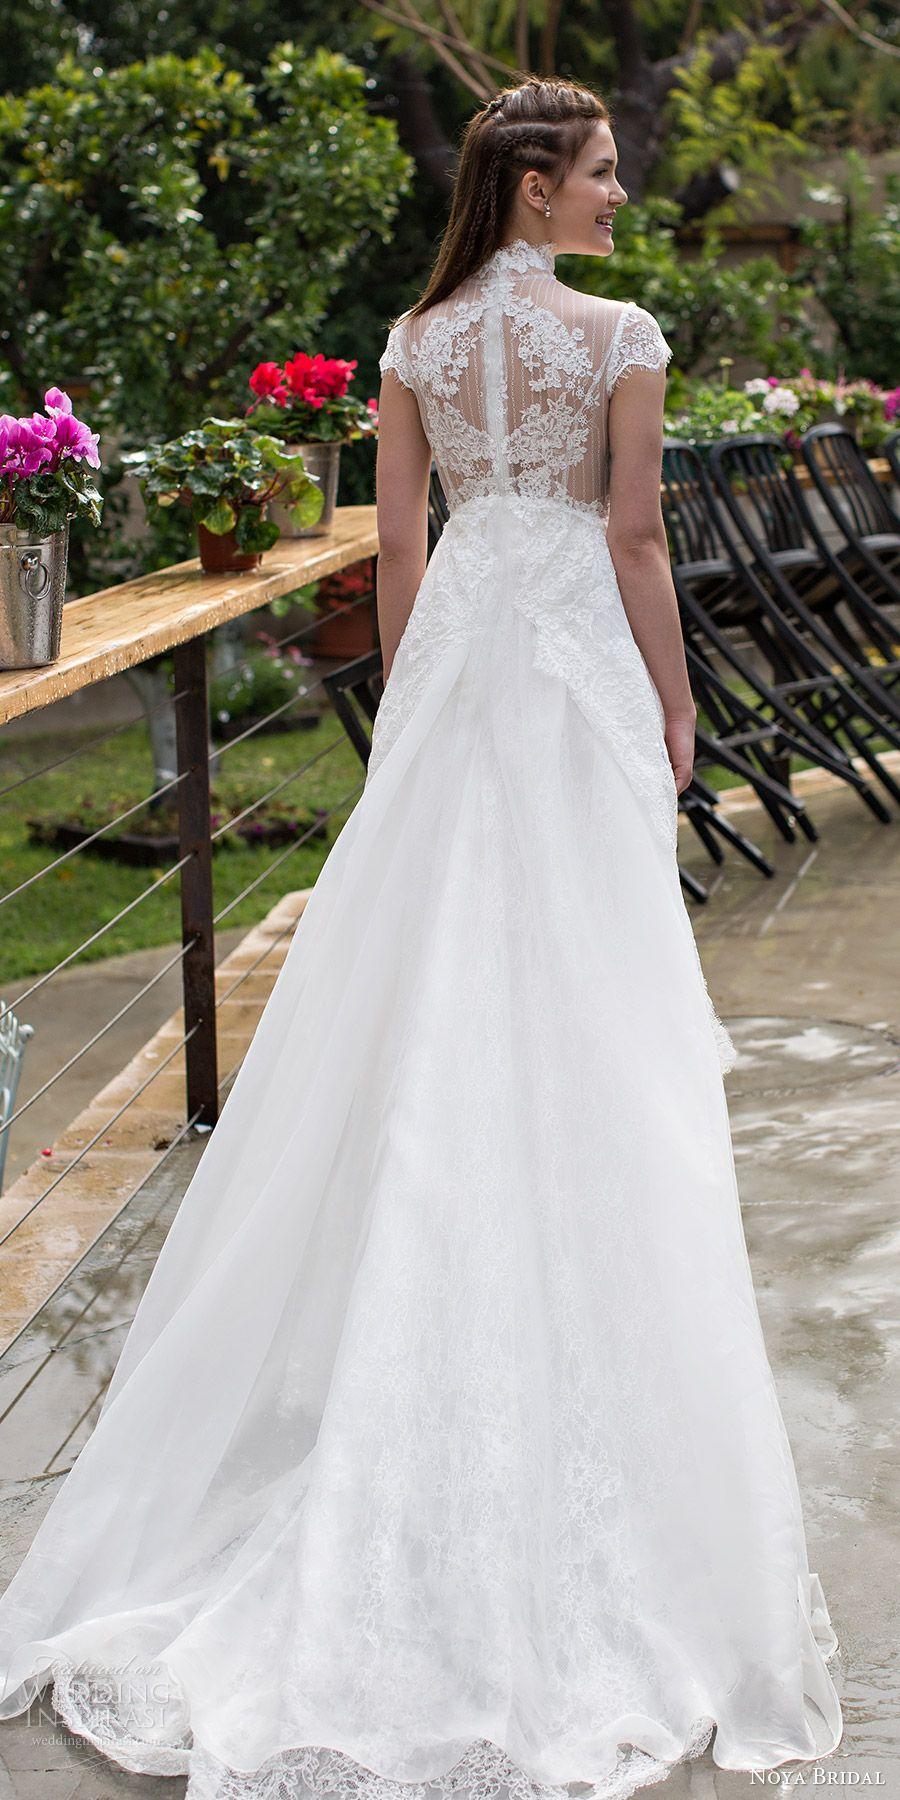 Noya bridal ucariaud collection wedding dresses weddings pinterest